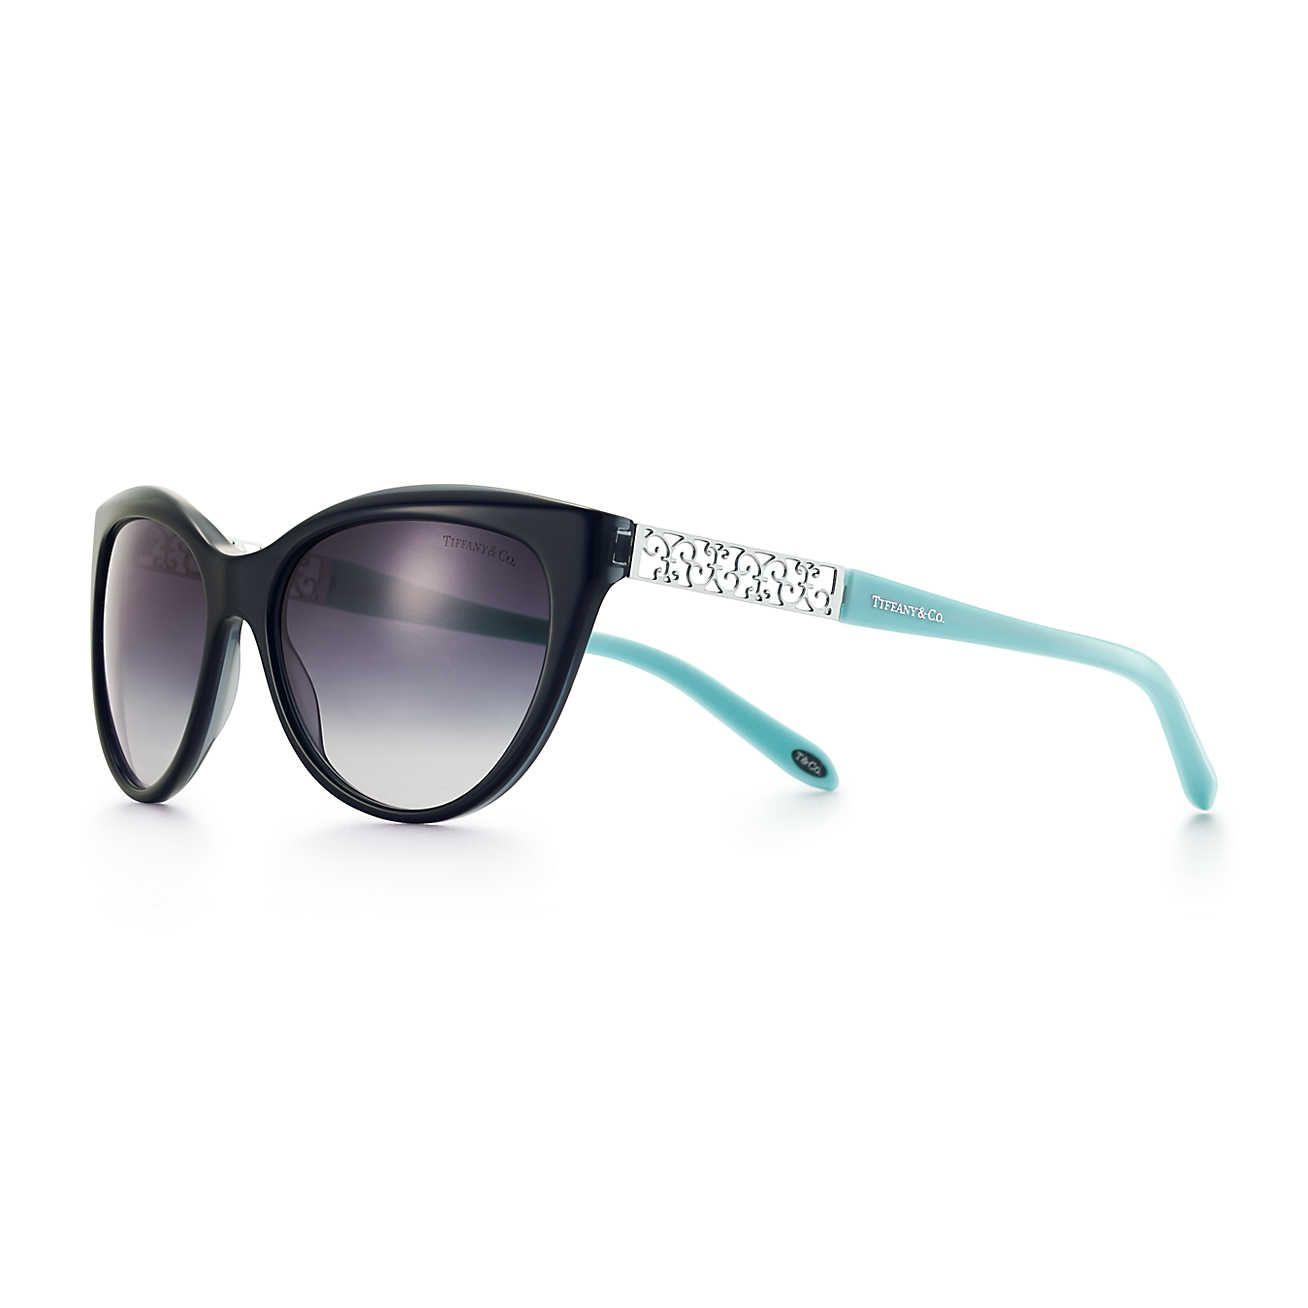 99b4f11a3a80 Tiffany Enchant® Cat Eye Sunglasses